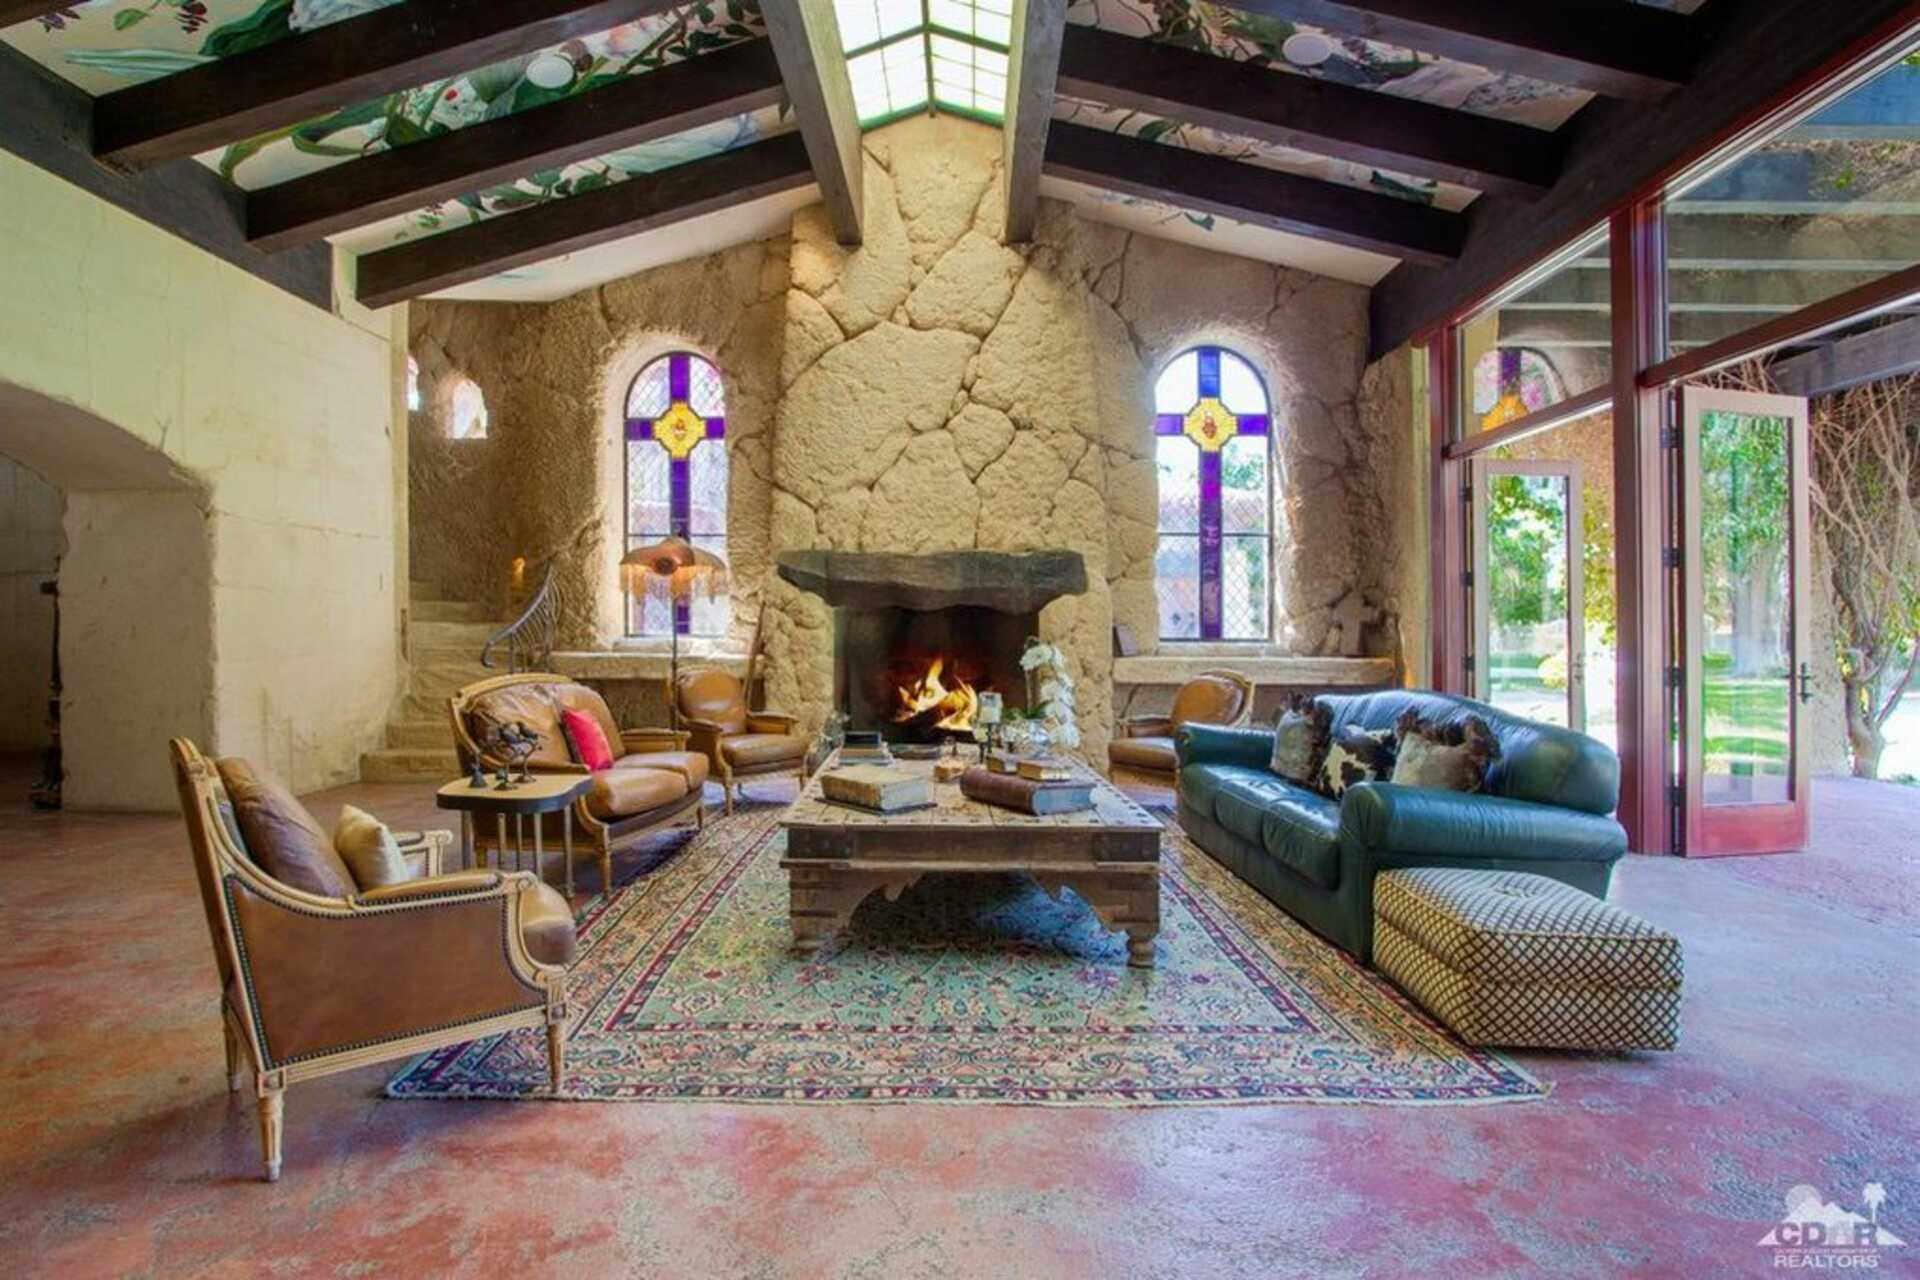 Dennis Miller Asks 22 5 Million For His So Cal Beach House